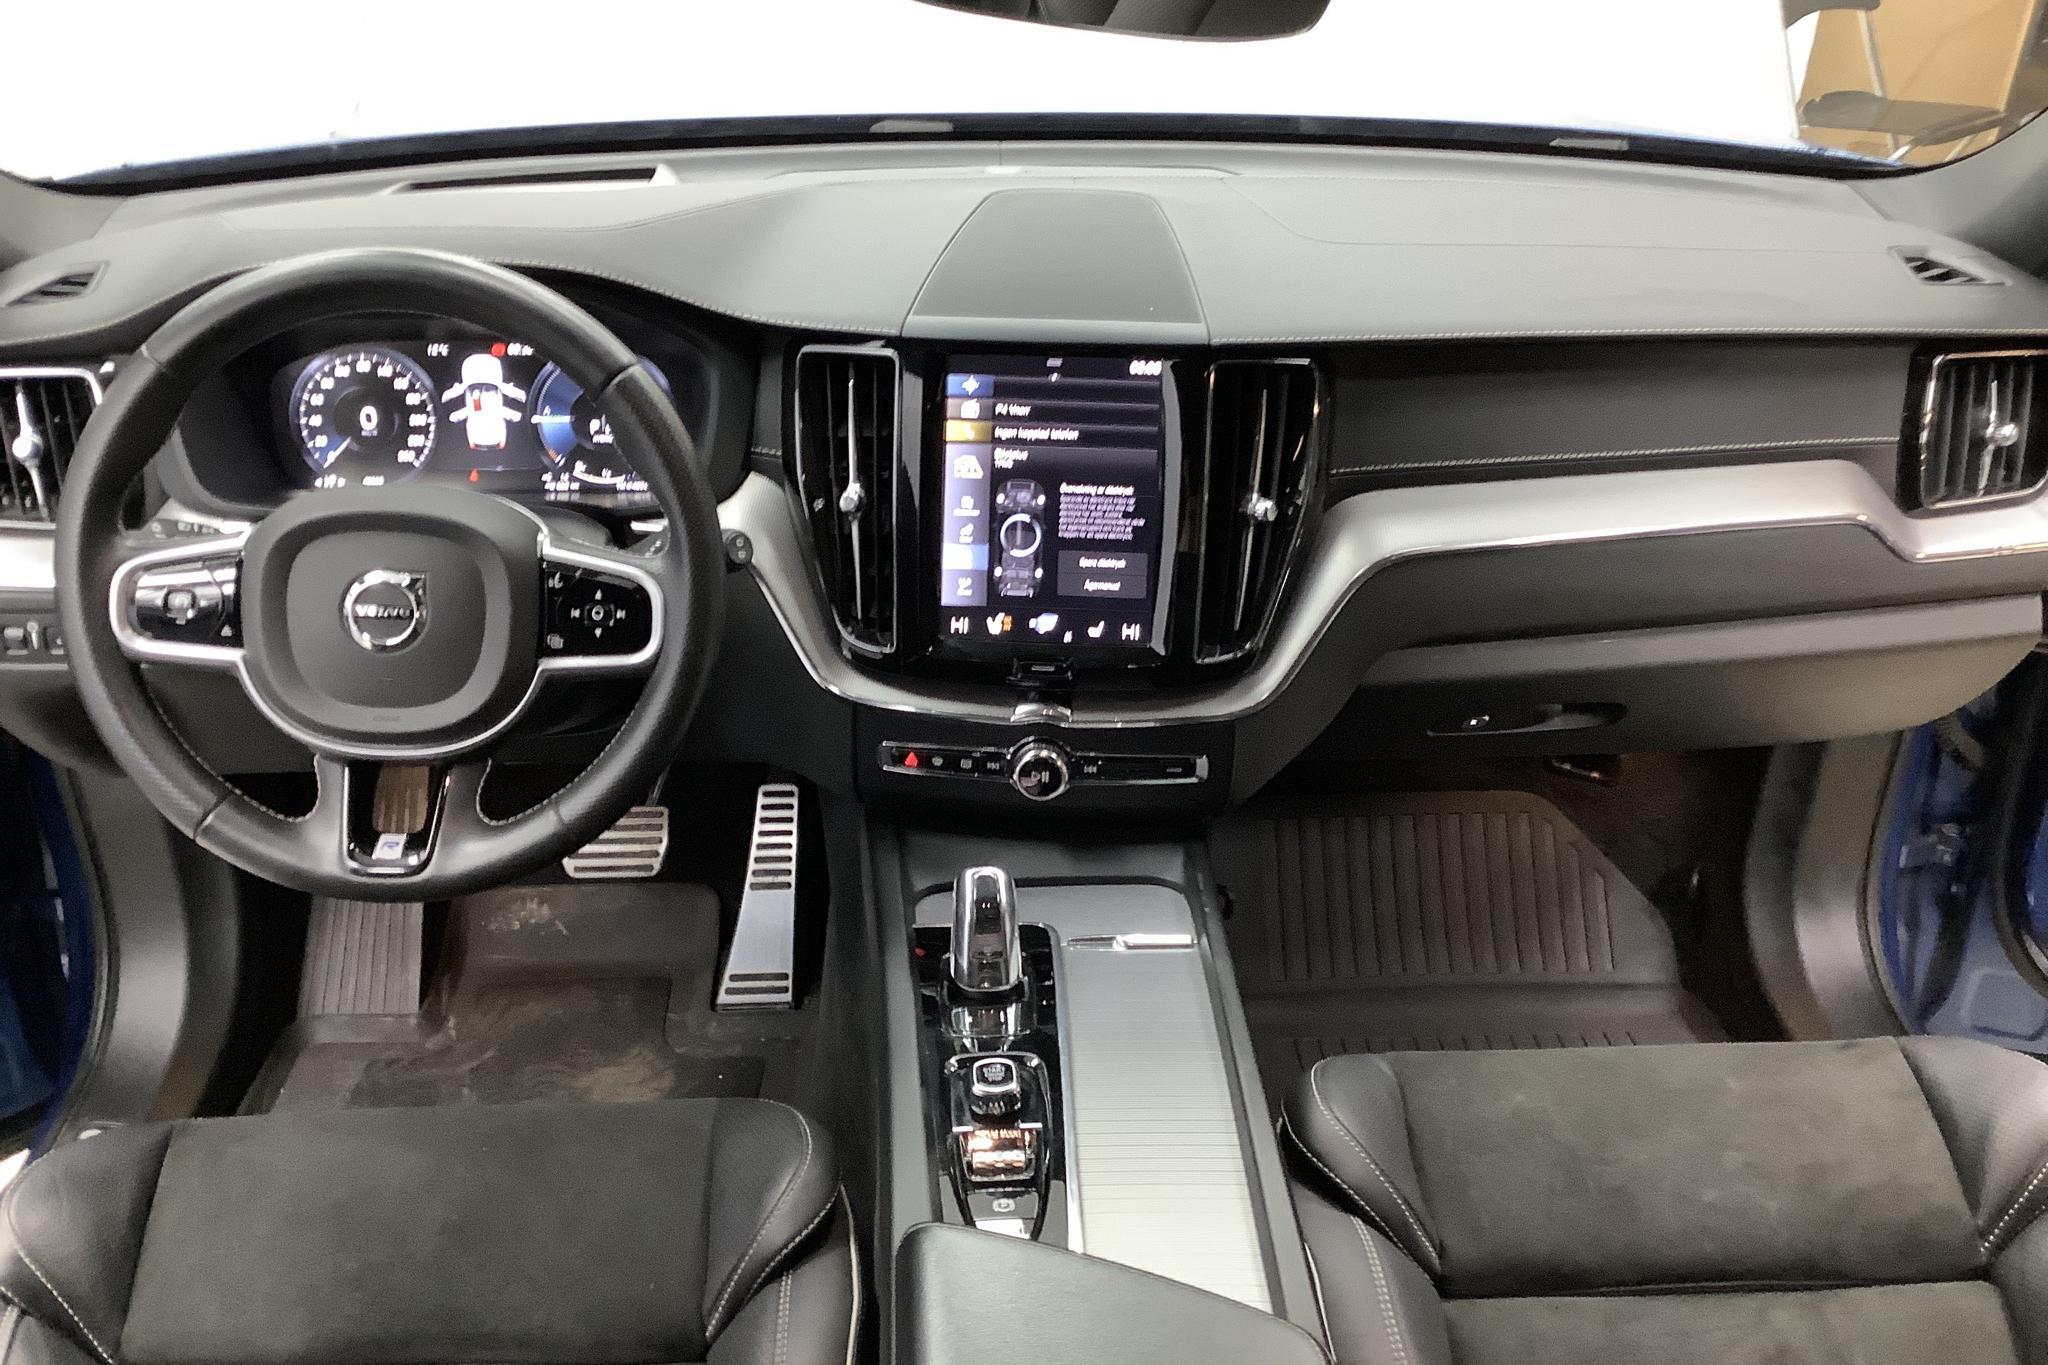 Volvo XC60 T8 AWD Twin Engine (390hk) - 49 670 km - Automatic - blue - 2019